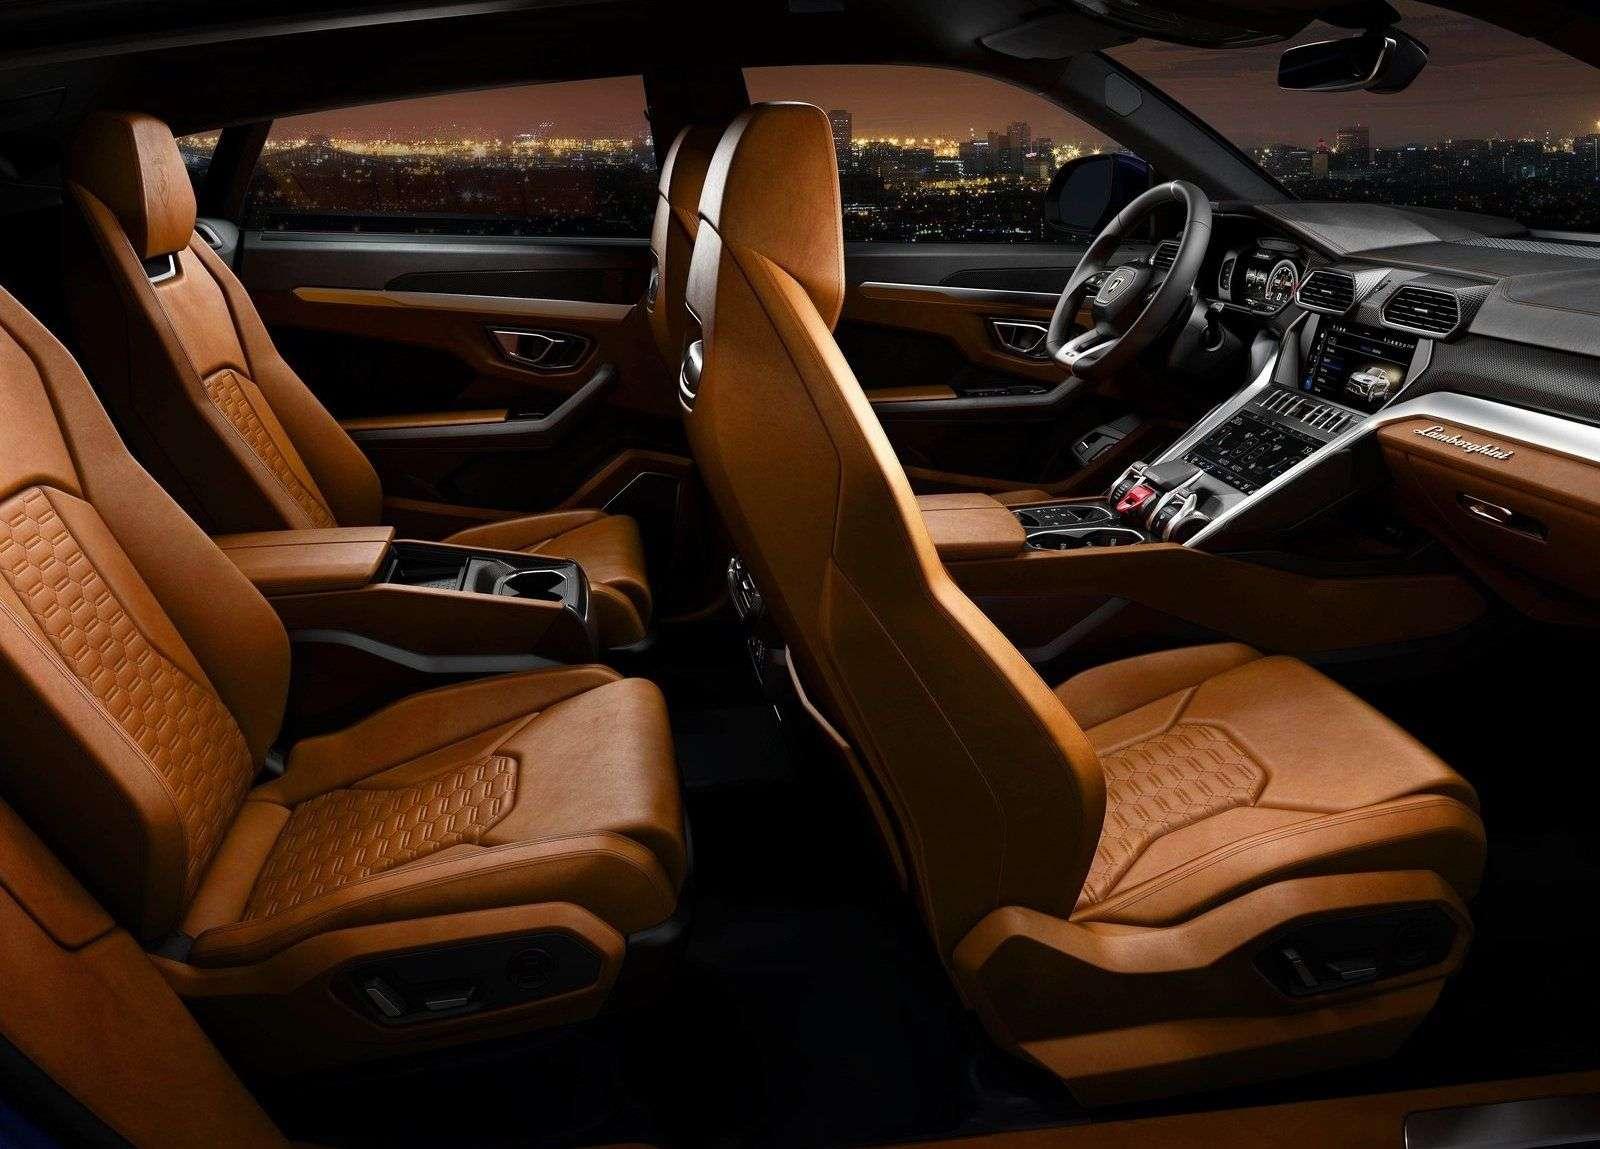 1512663143 dva ryada sideniy sportivnogo krossover lamborghini urus 2019 - Обзор кроссовера Lamborghini Urus 2019